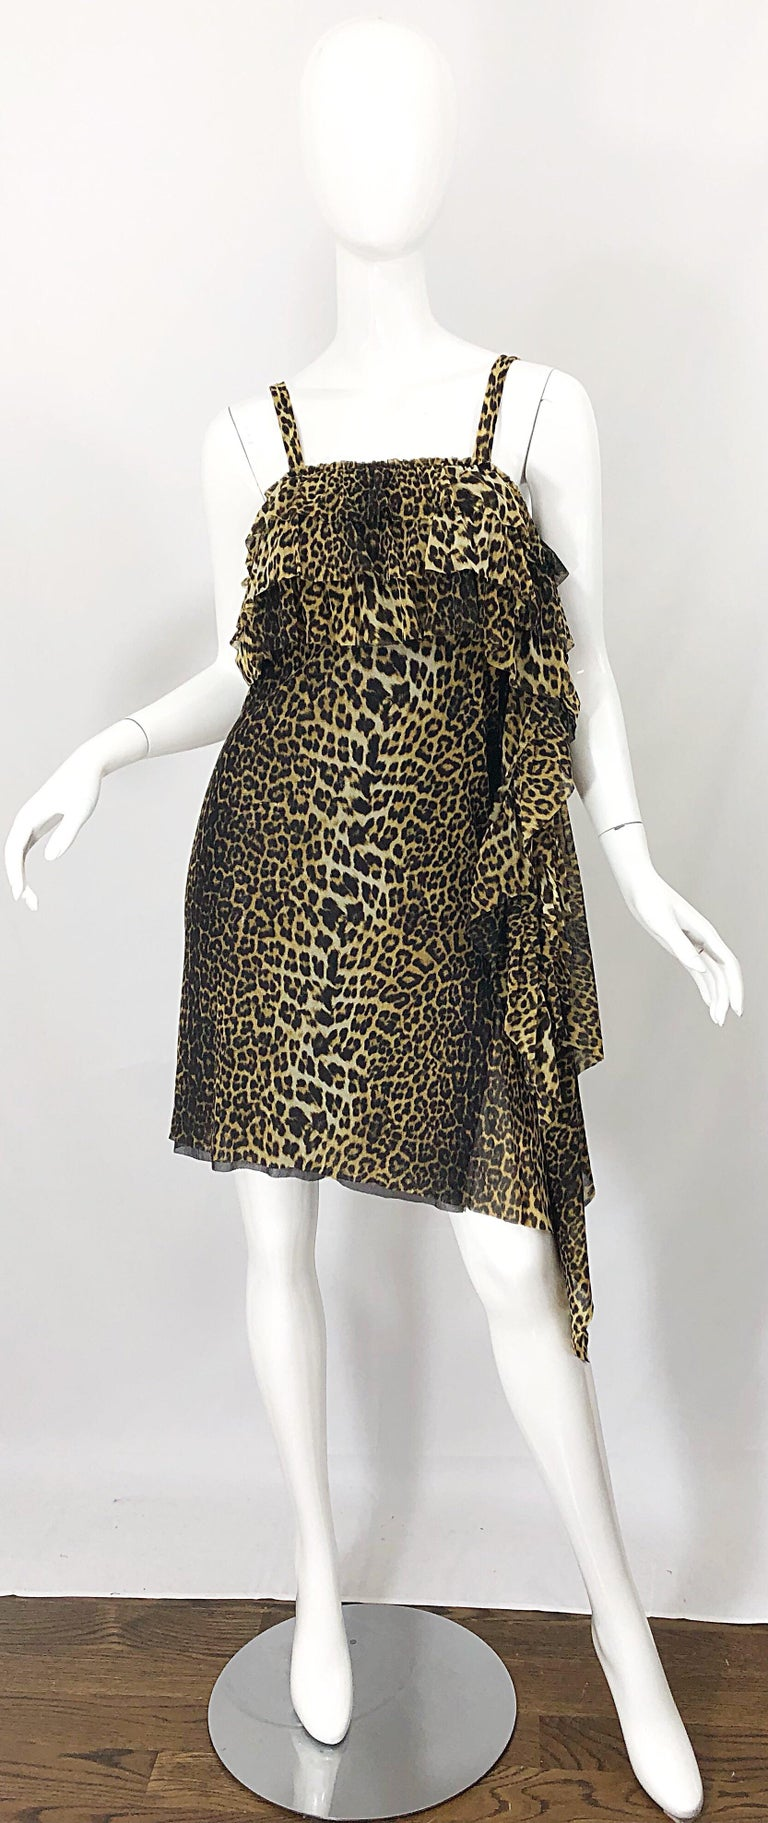 Vintage Jean Paul Gaultier 1990s Leopard Cheetah Animal Print 90s Sash Dress For Sale 7